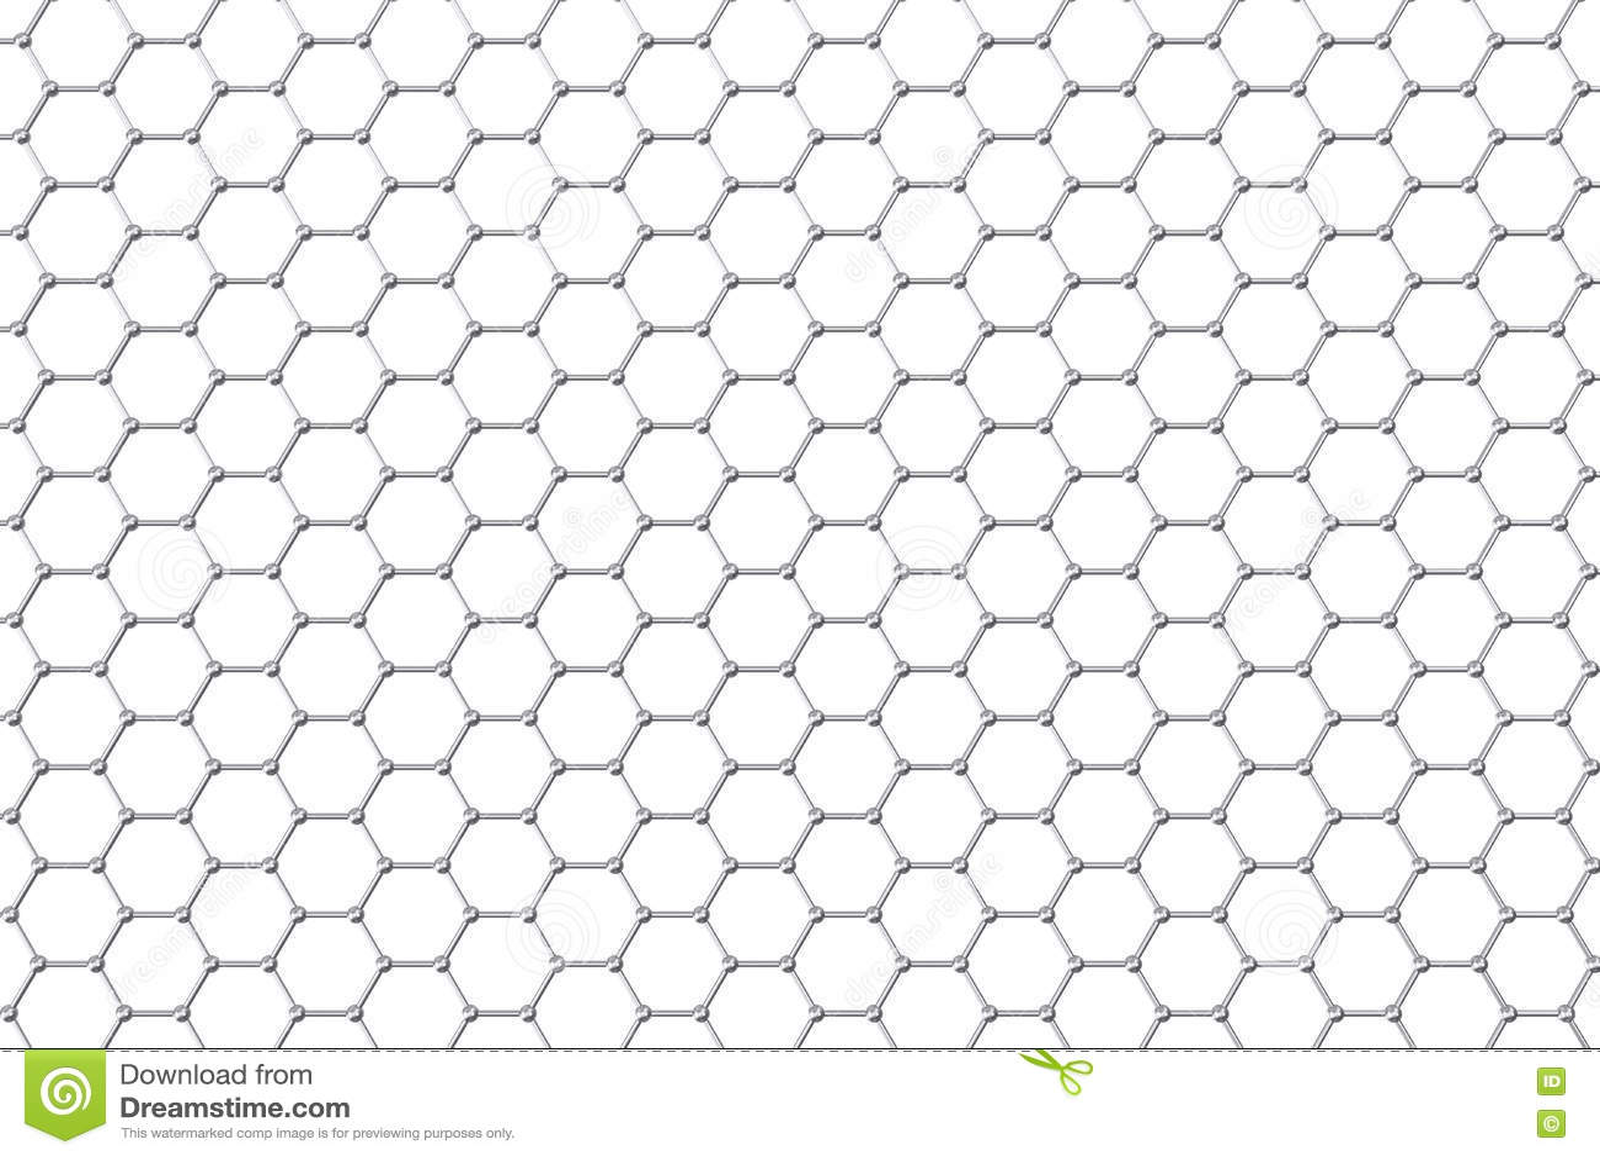 Graphene Atomic Structure Nanotechnology Background 3d